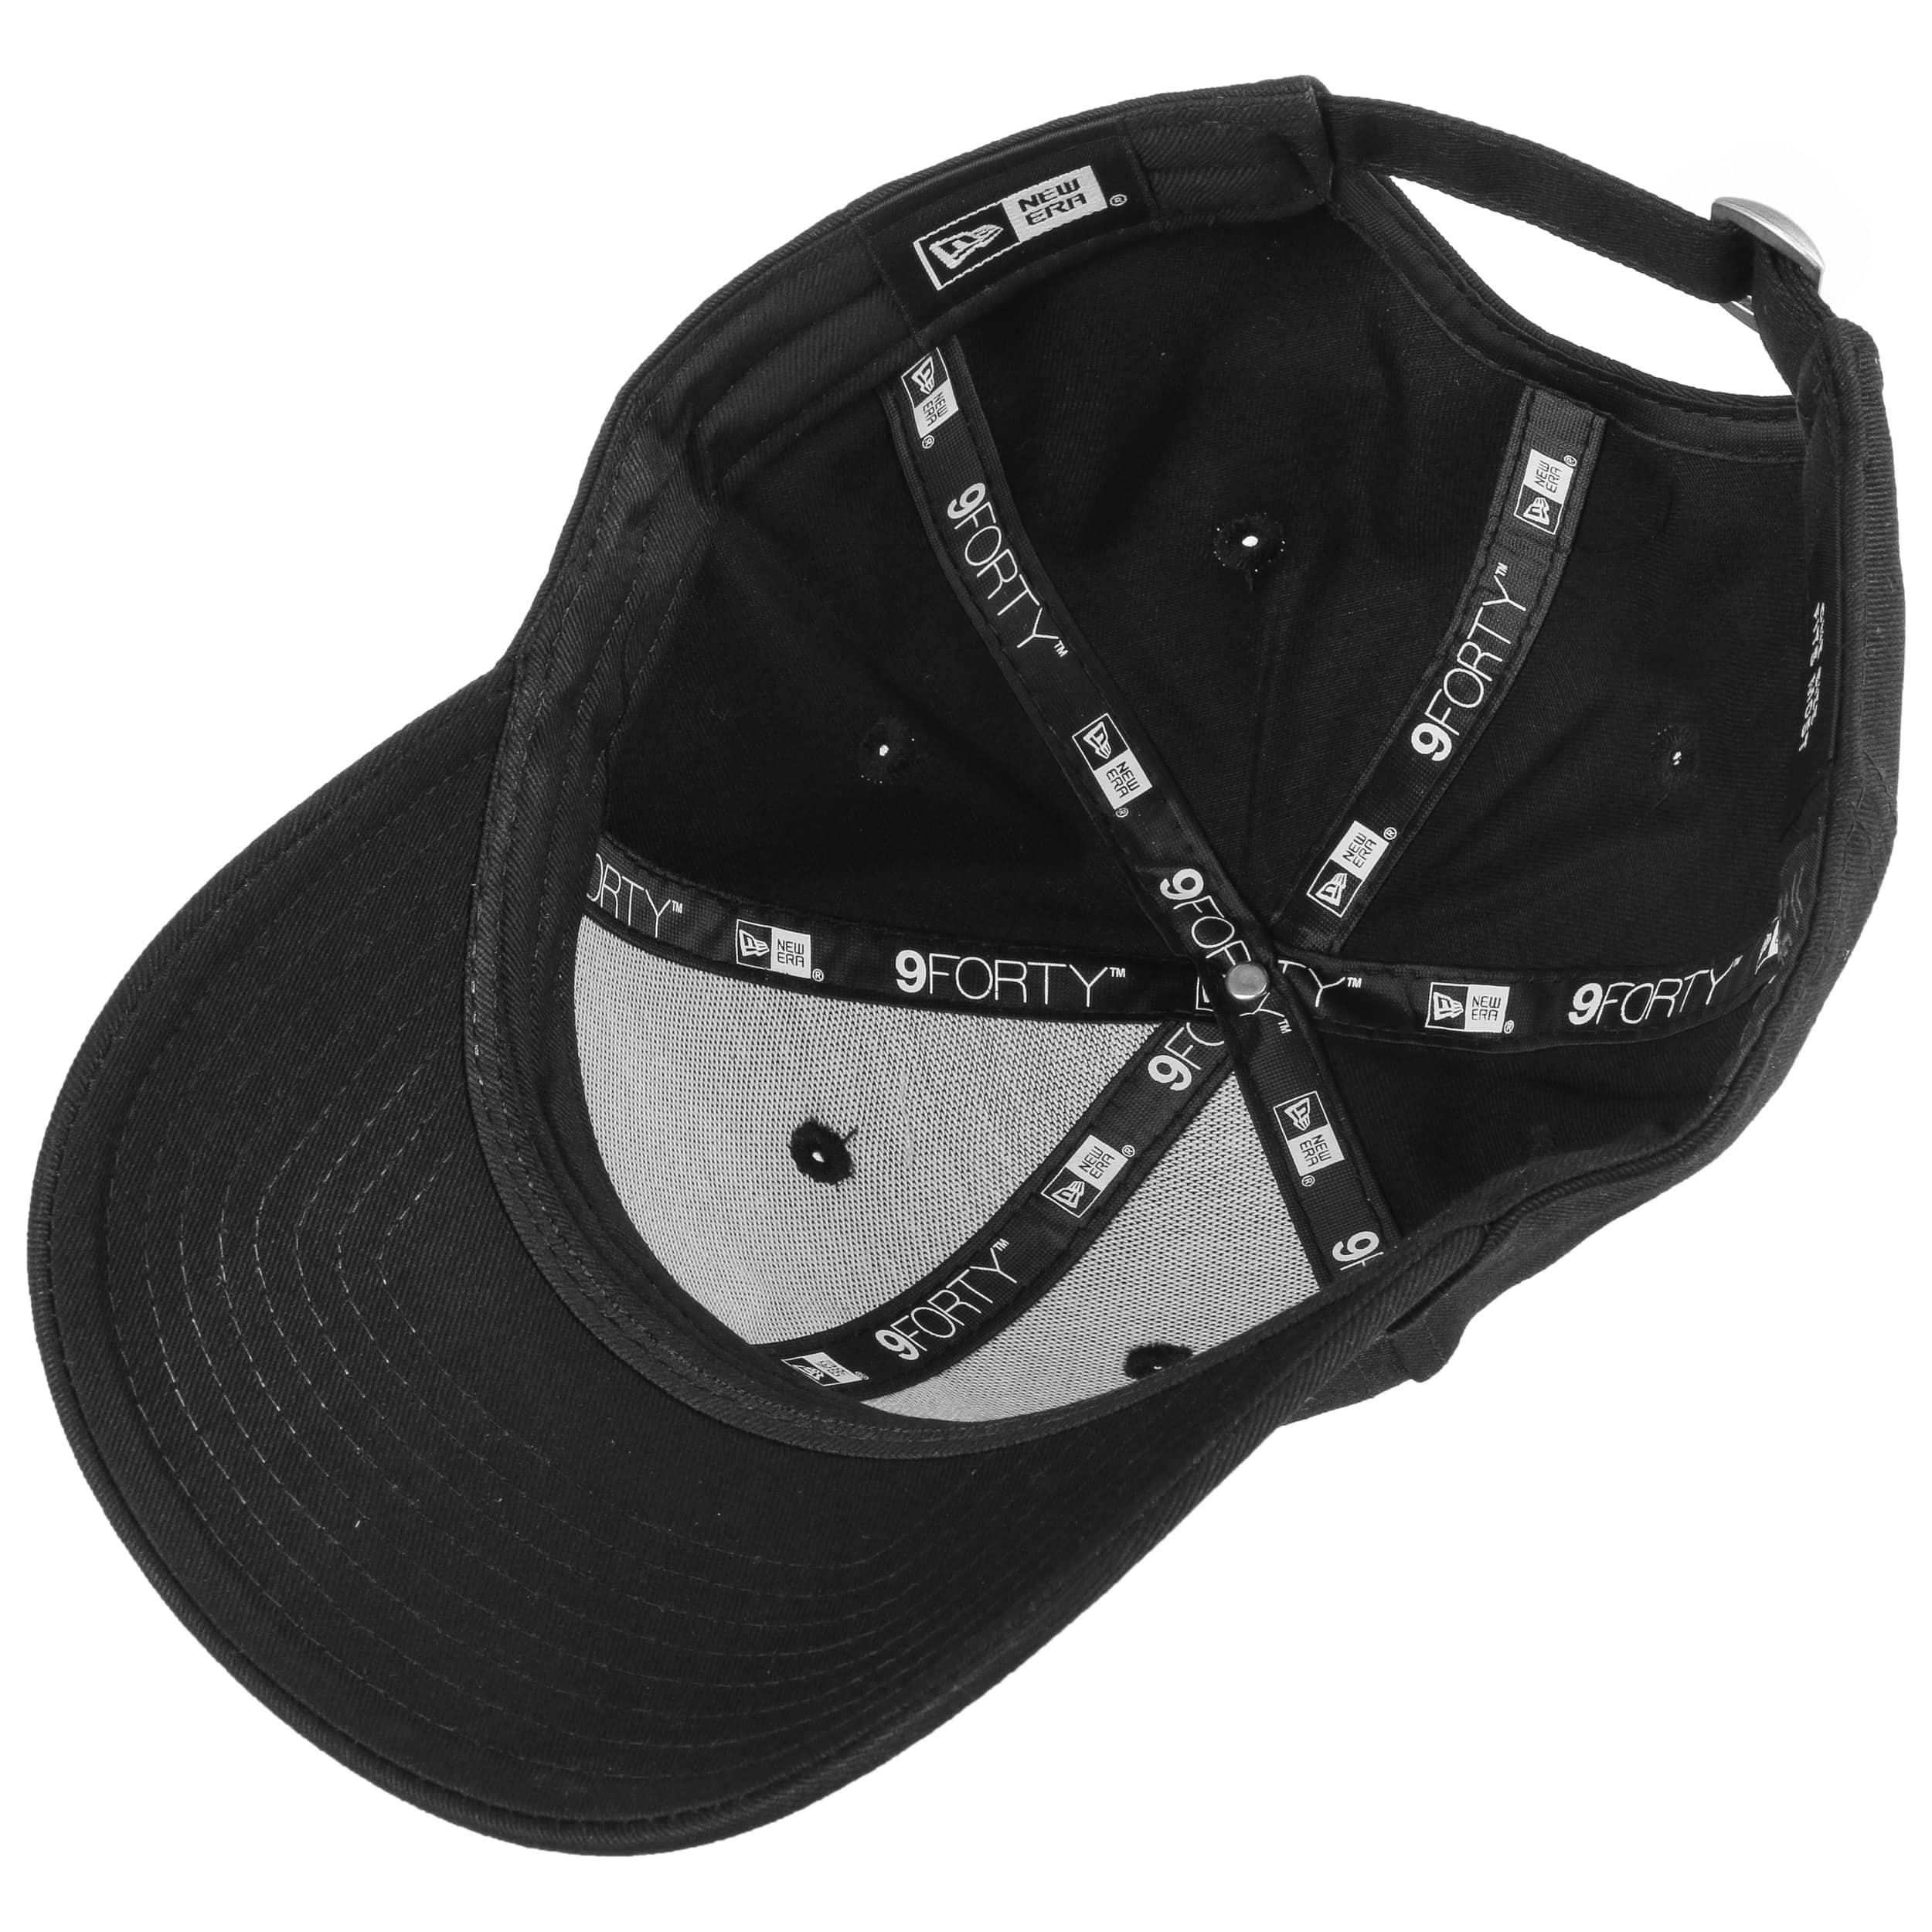 ... 9Forty League Basic Yankees Cap by New Era - black 2 ... 44c6223abcf